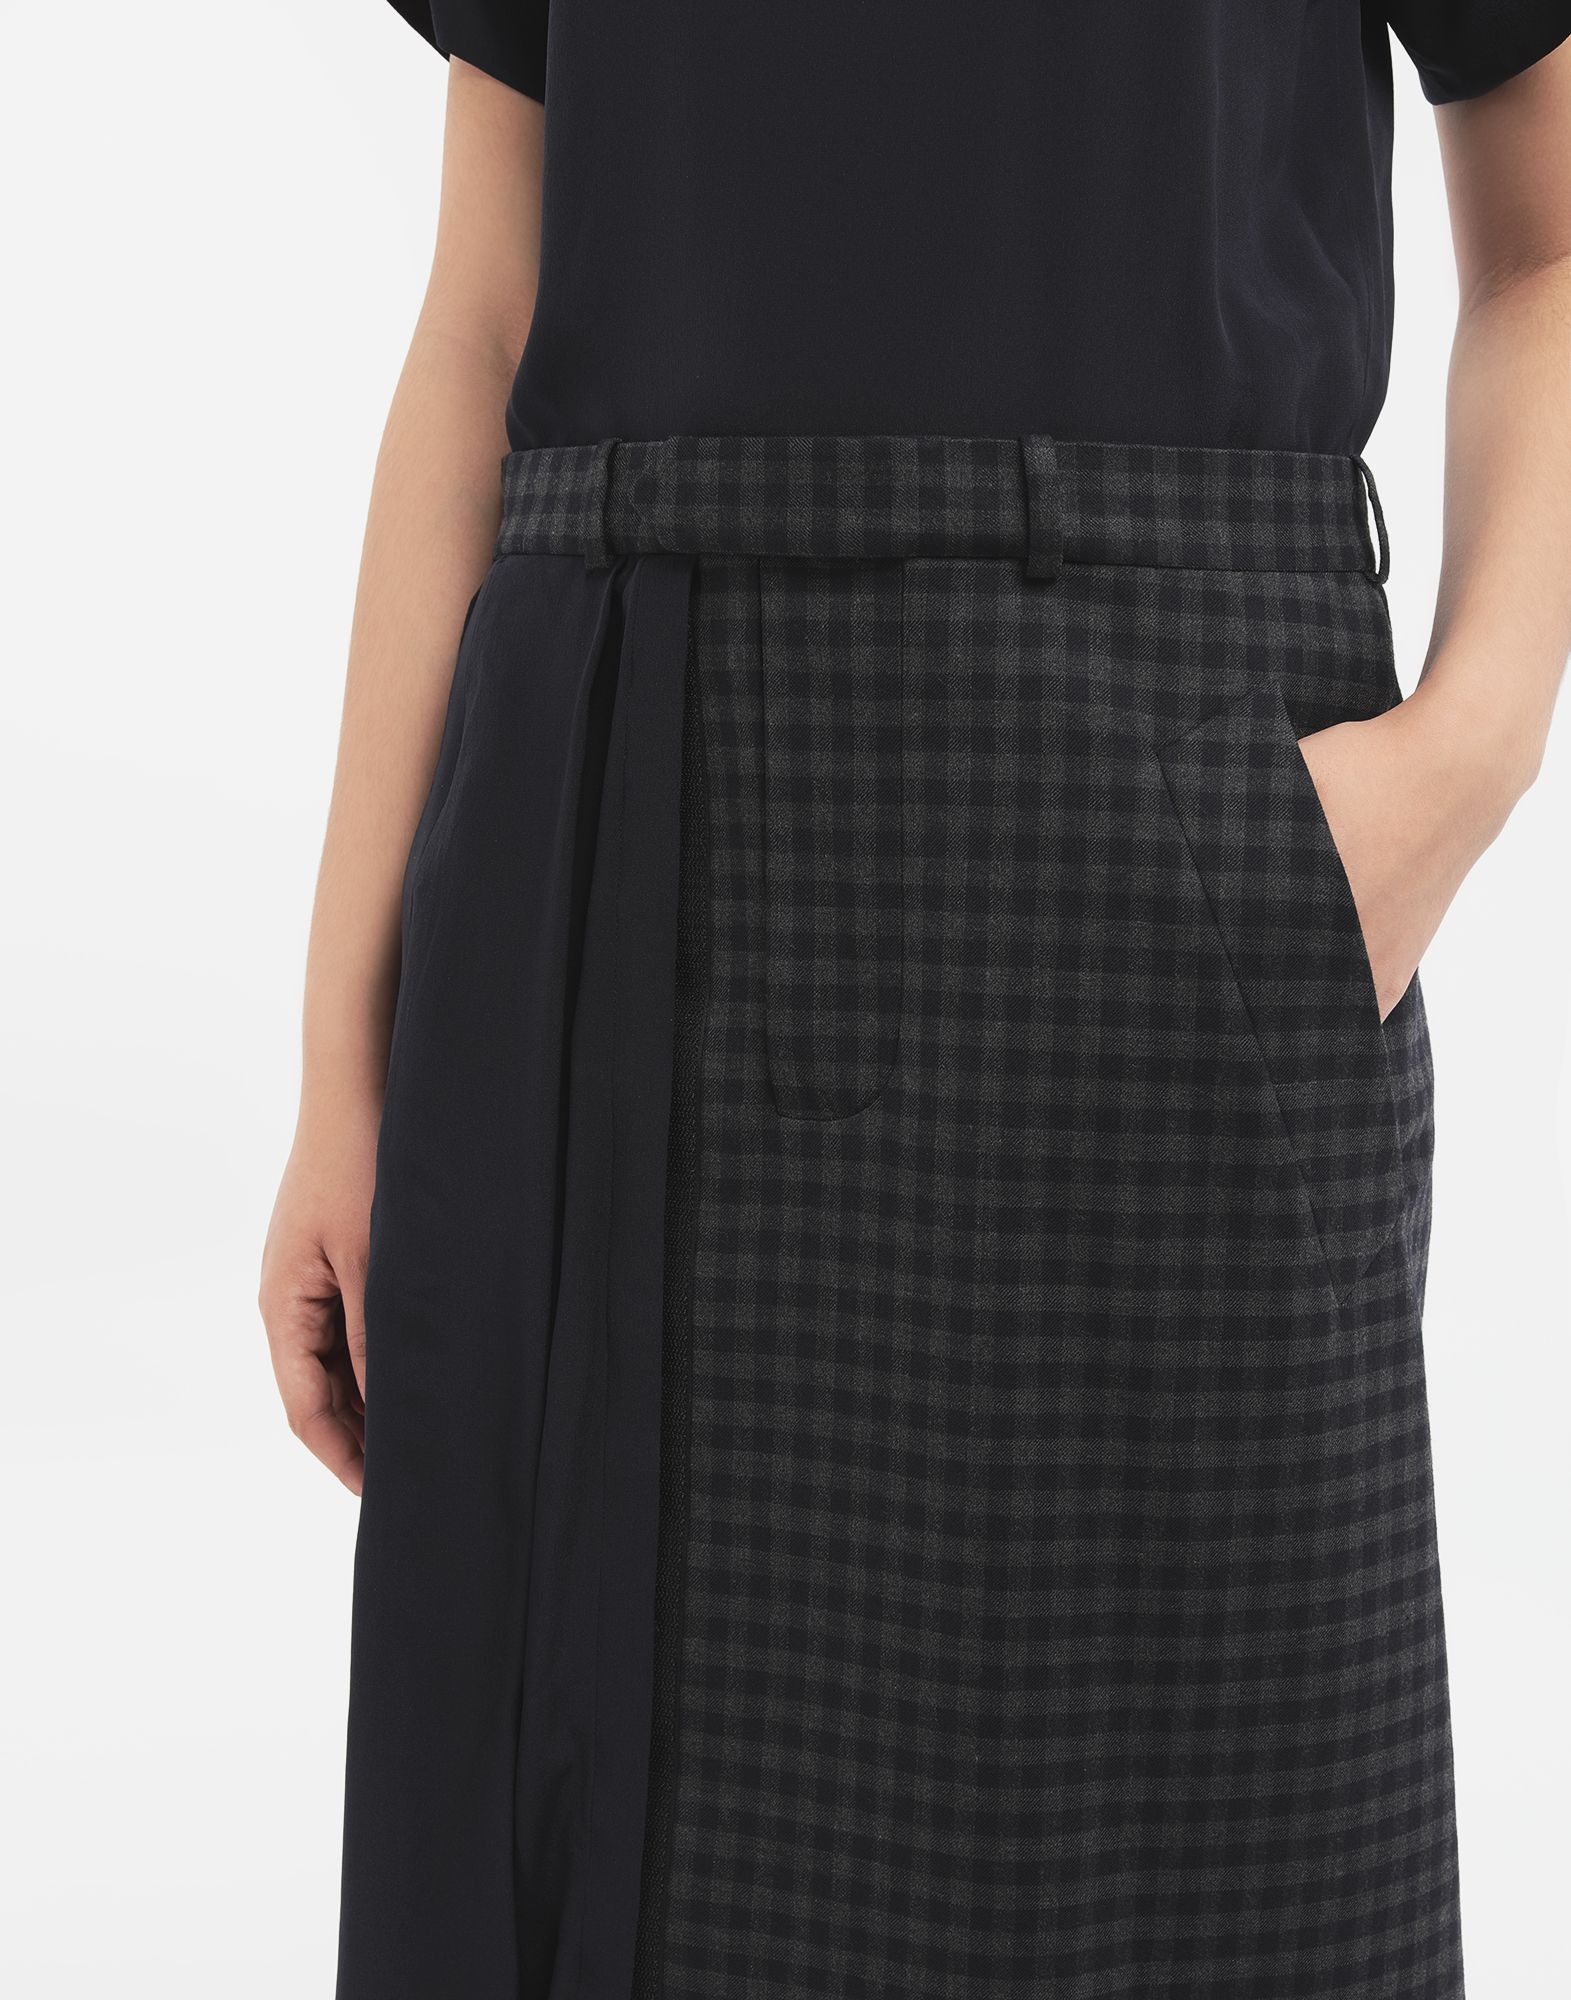 MAISON MARGIELA Reworked check dress 3/4 length dress Woman a